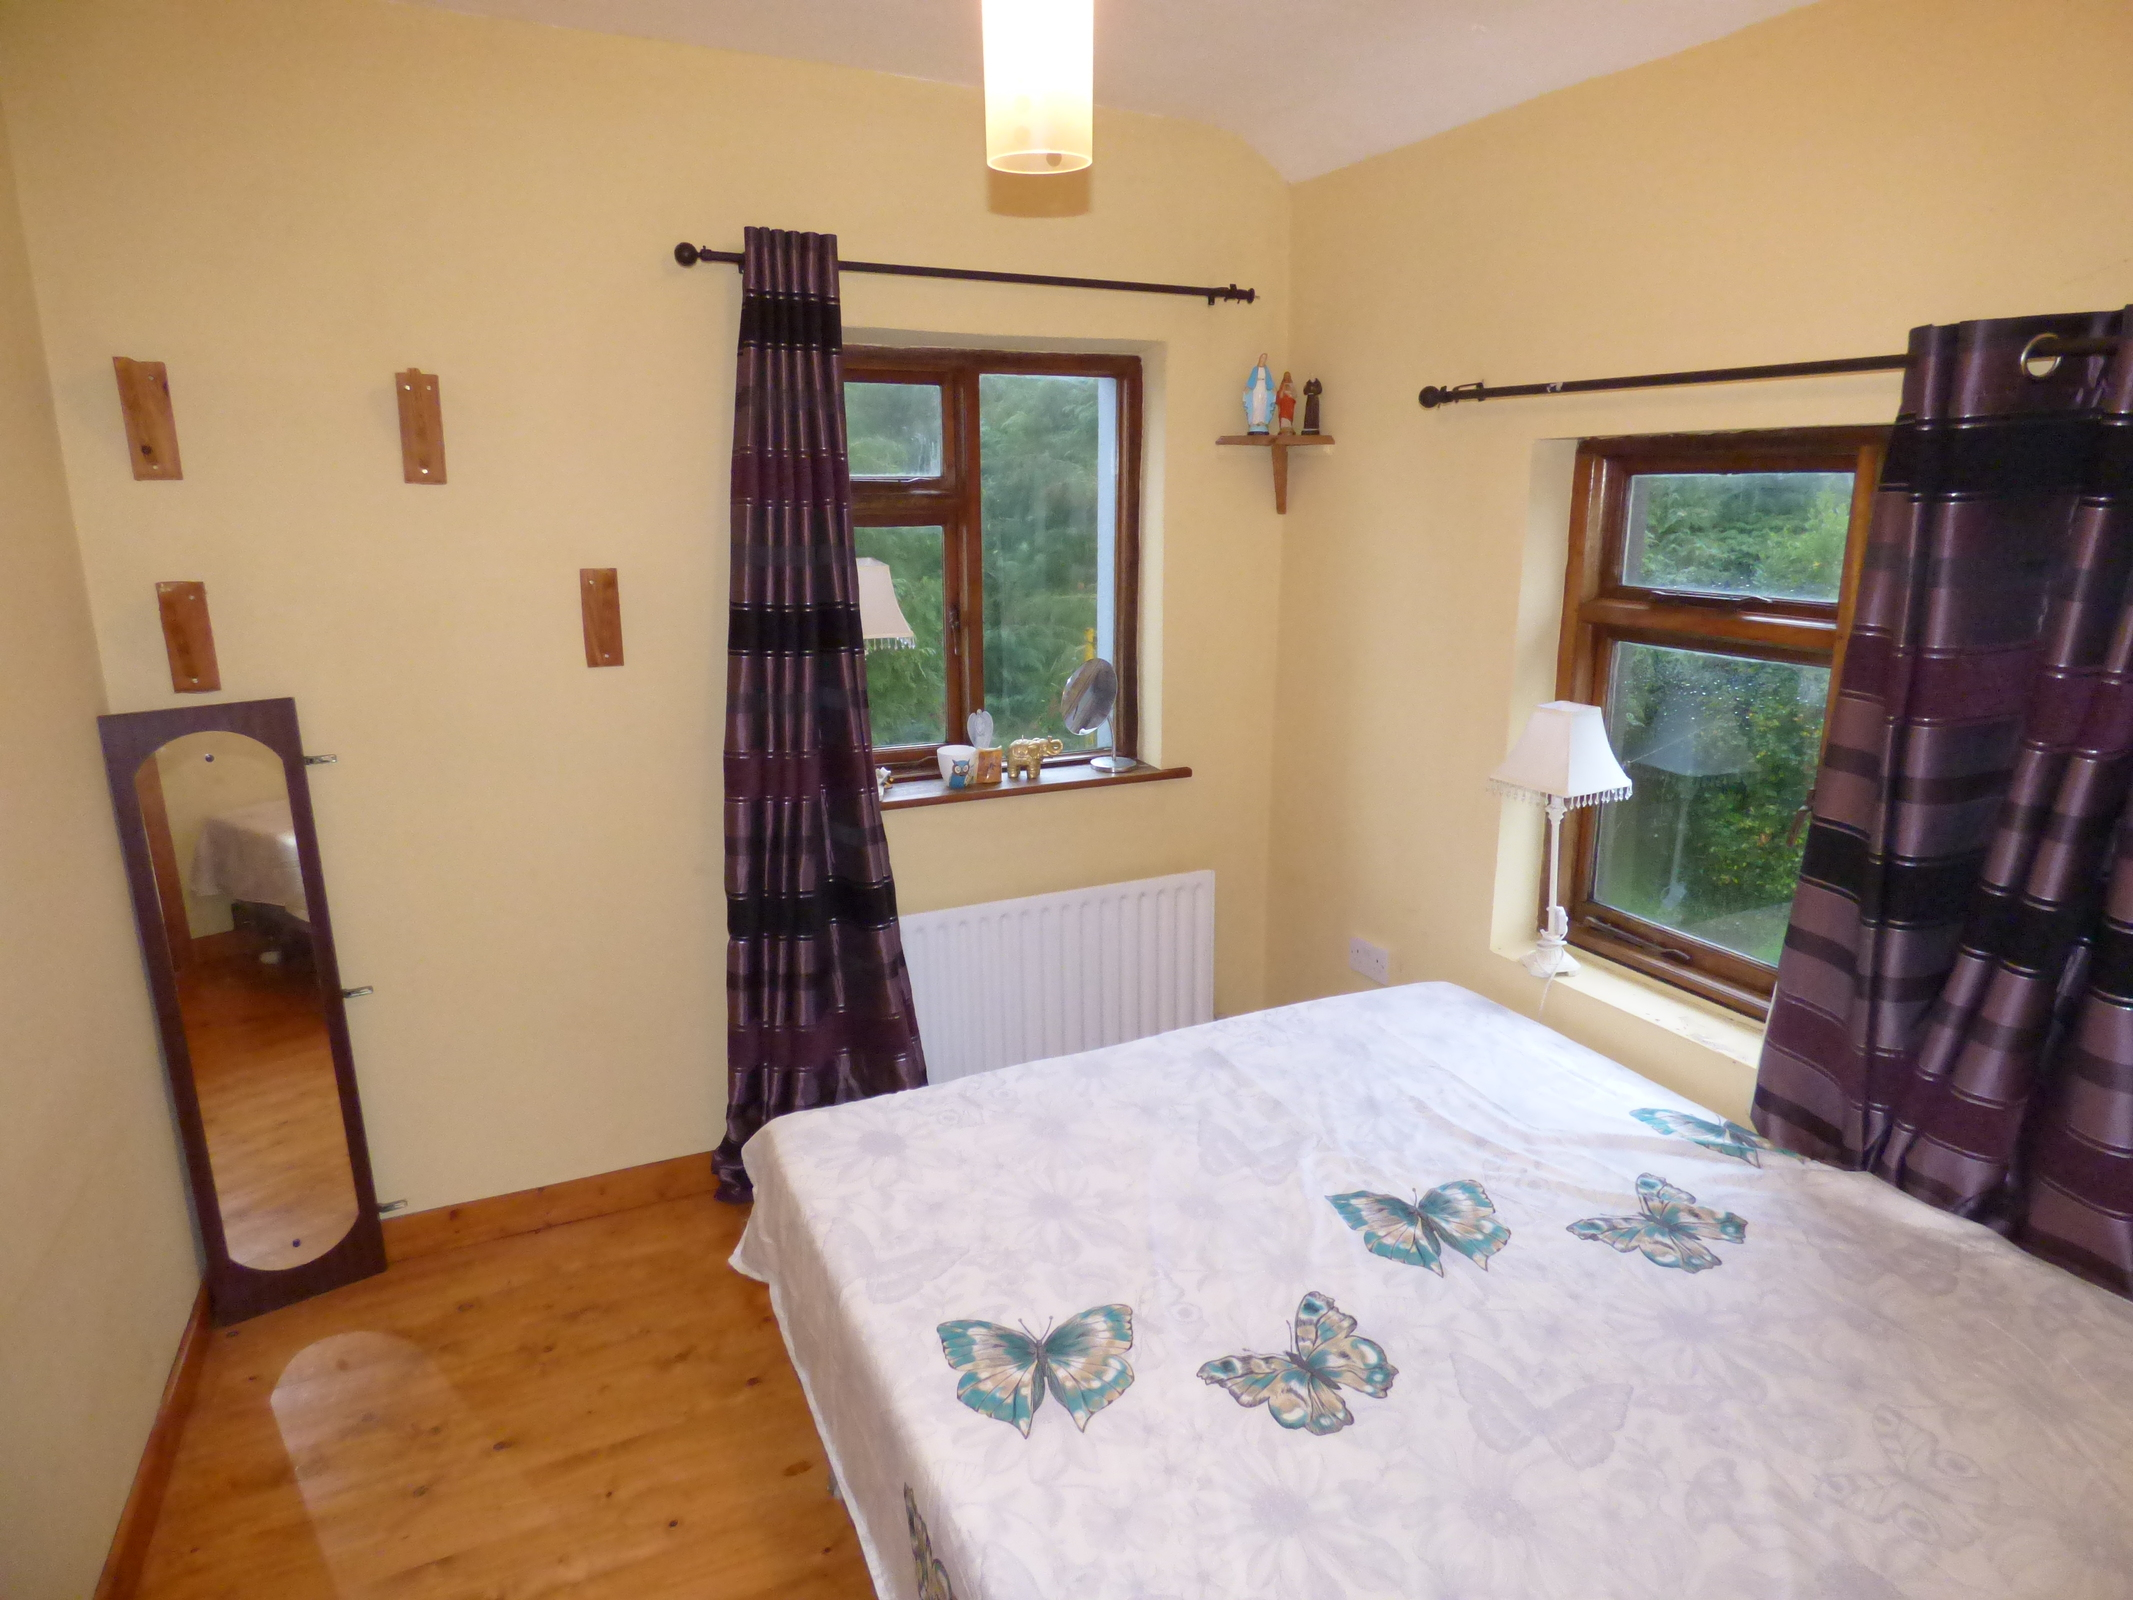 Brook Lodge, Redcross, Co. Wicklow